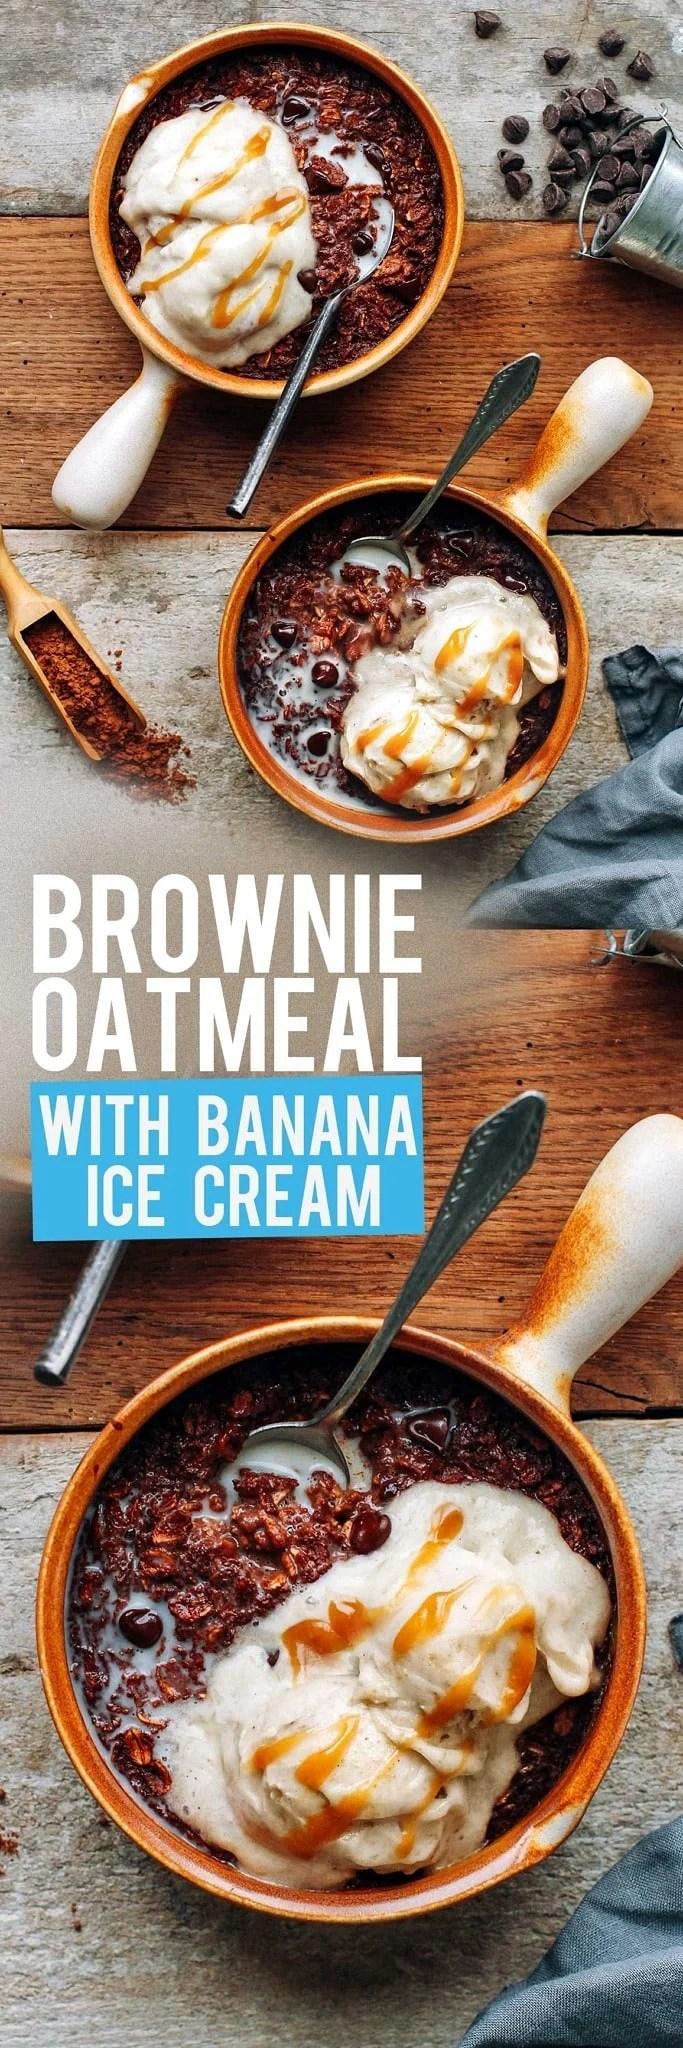 Brownie Oatmeal with Banana Ice cream (Hot & Cold!)